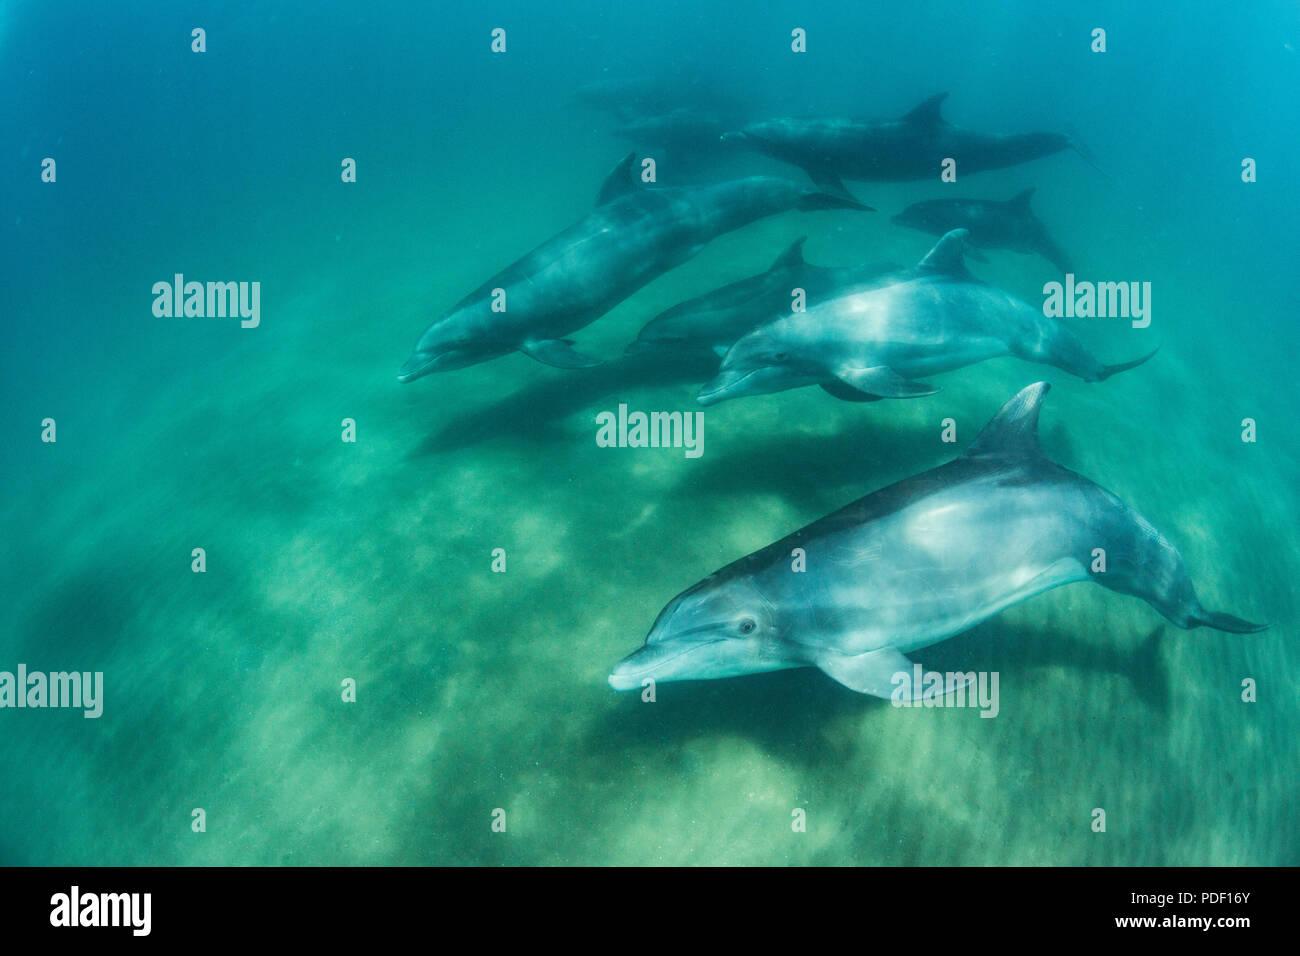 A pod of common bottlenose dolphins, Tursiops truncatus, underwater at El Mogote, Baja California Sur, Mexico. Stock Photo